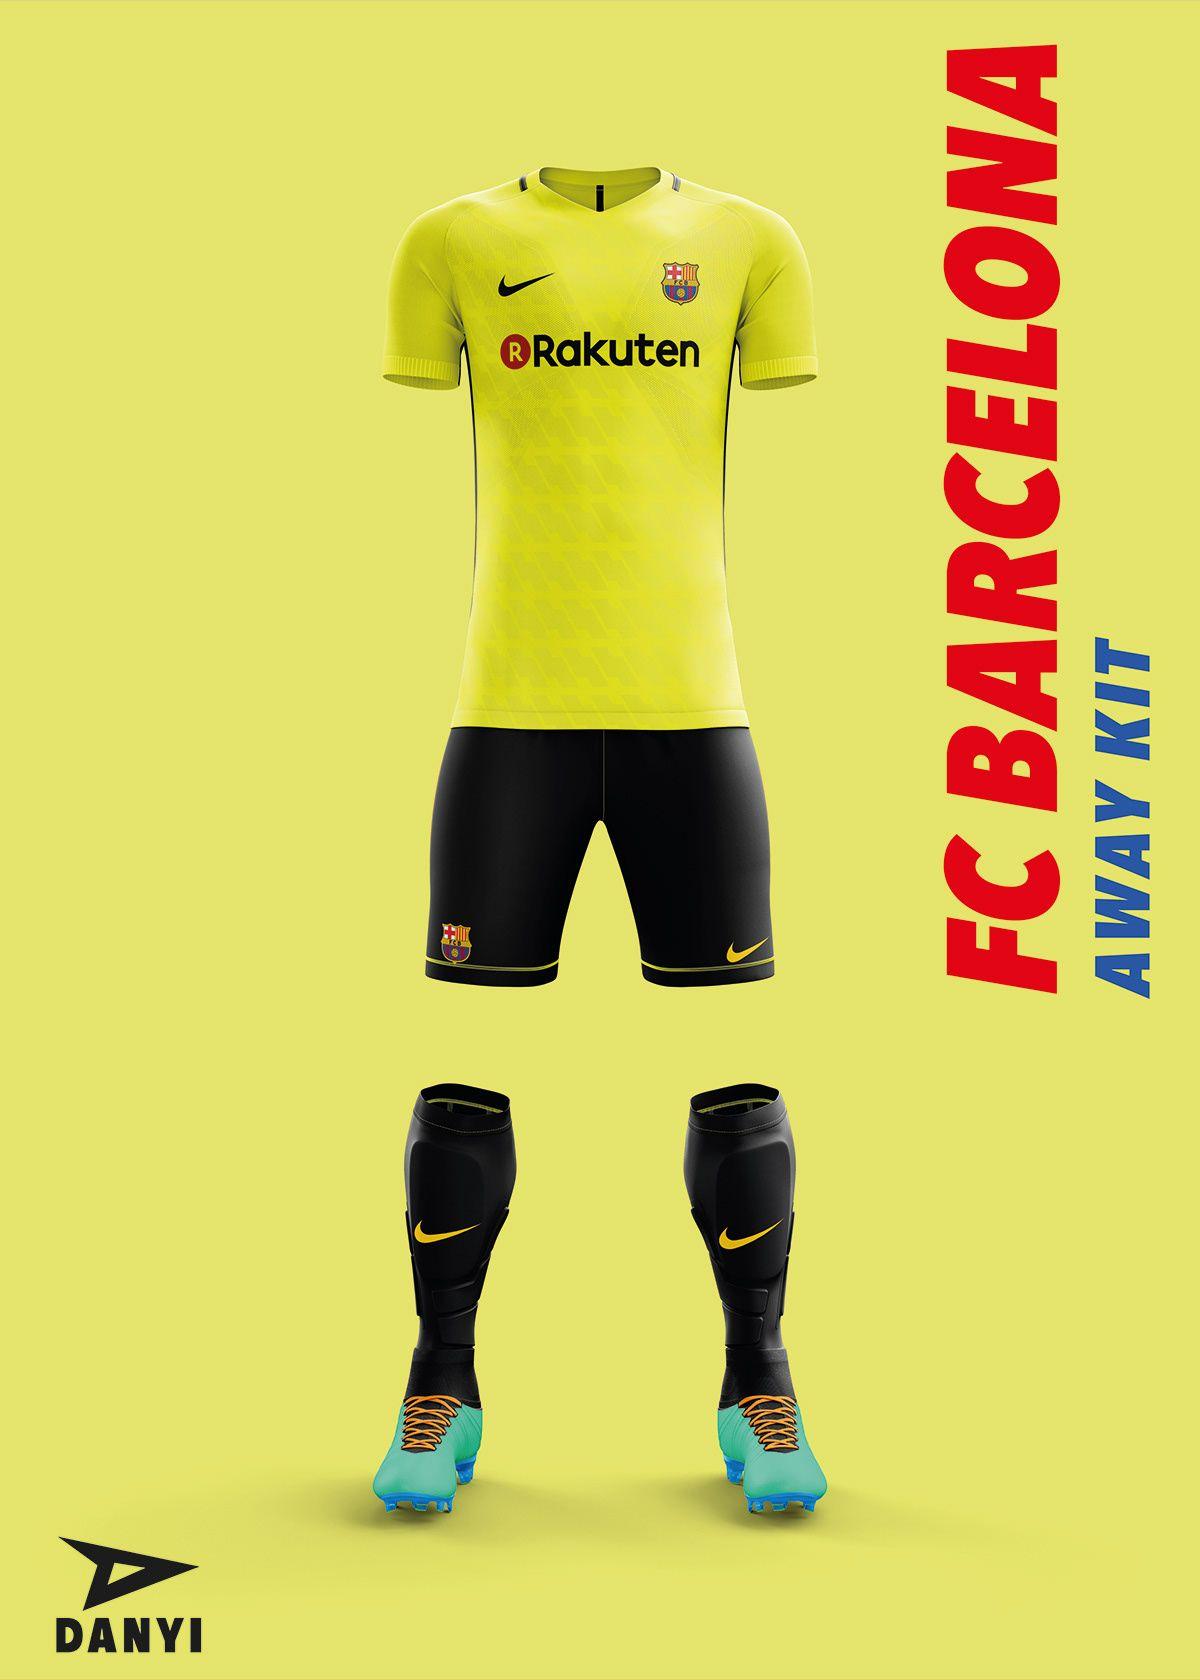 bd0bb54b36d FC Barcelona Football Kit 19 20. on Behance